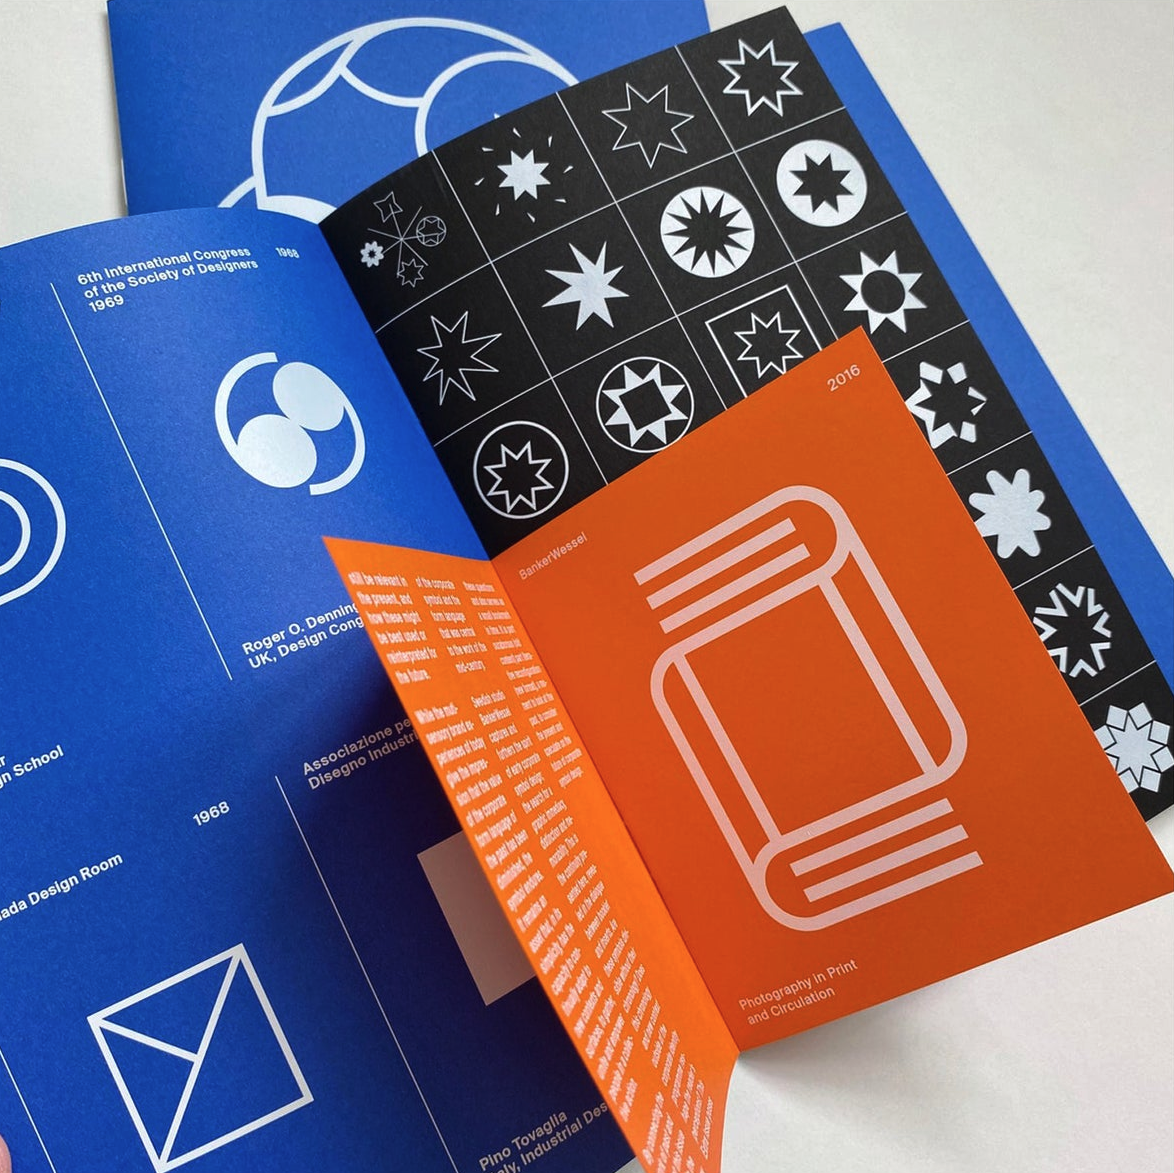 Richard Baird —LogoArchive Extra Issue 3